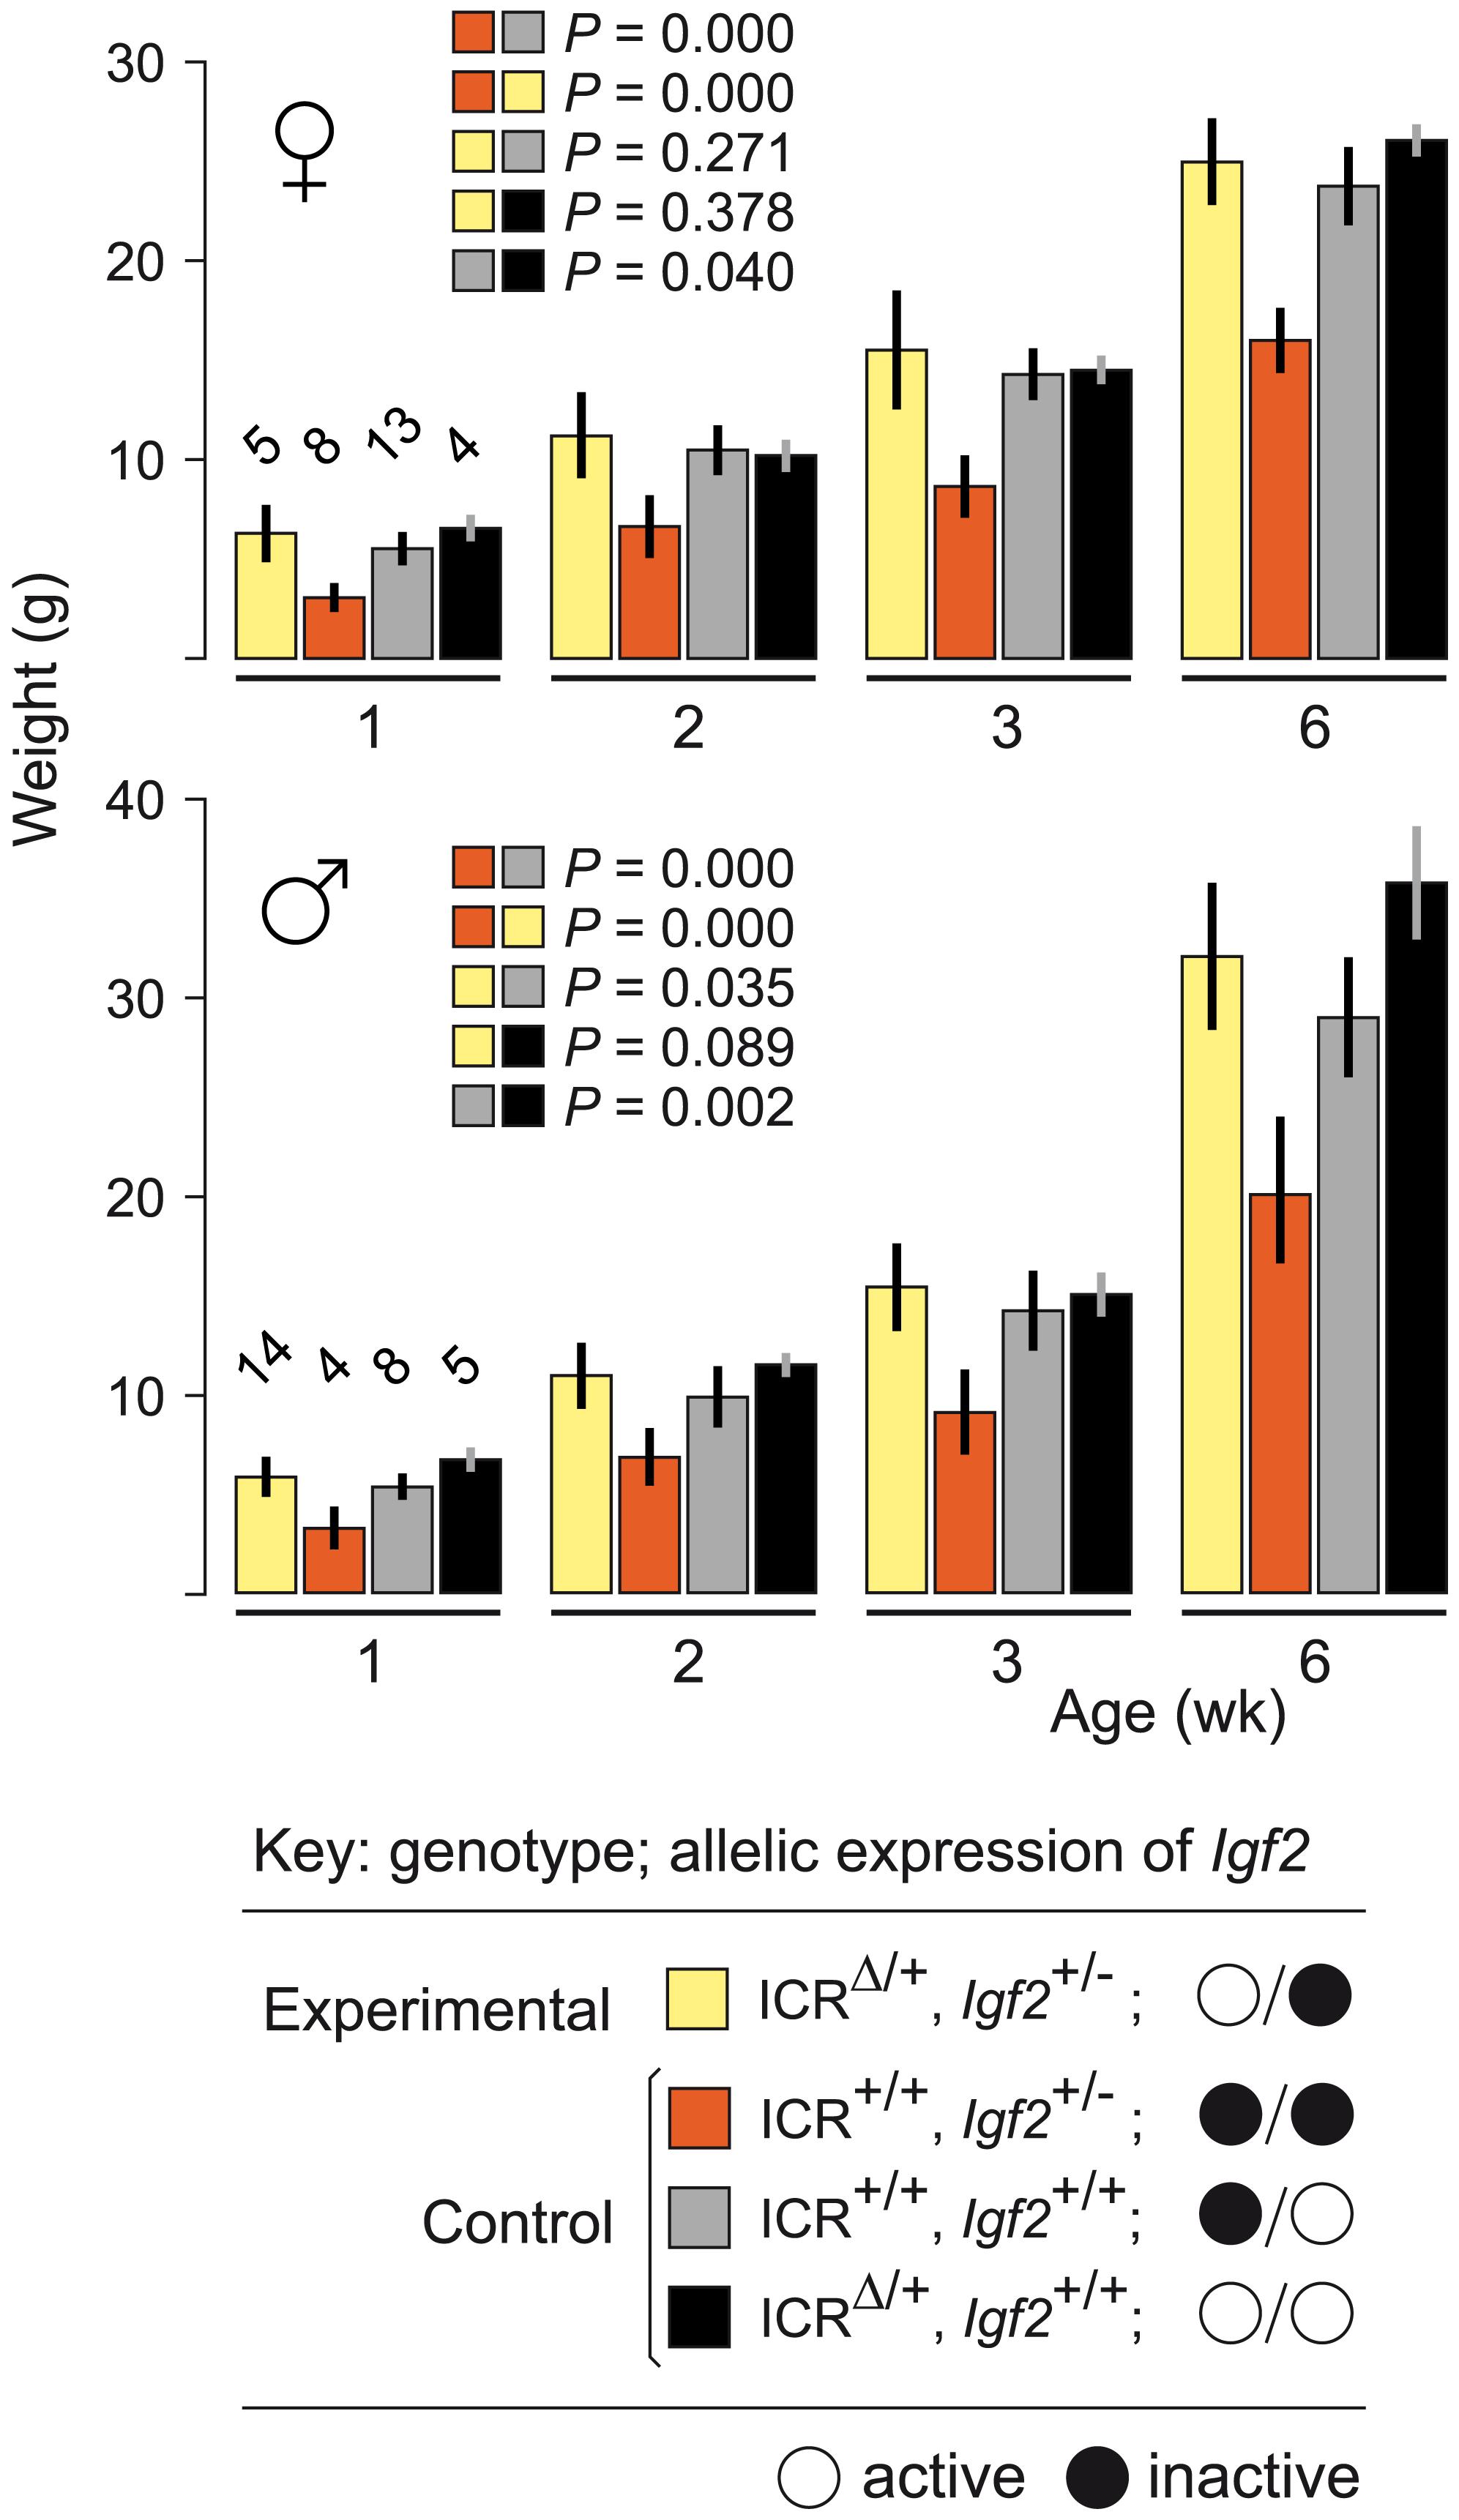 Weight gain in <i>Igf2</i> mutants carrying ICR<sup>Δ</sup>.